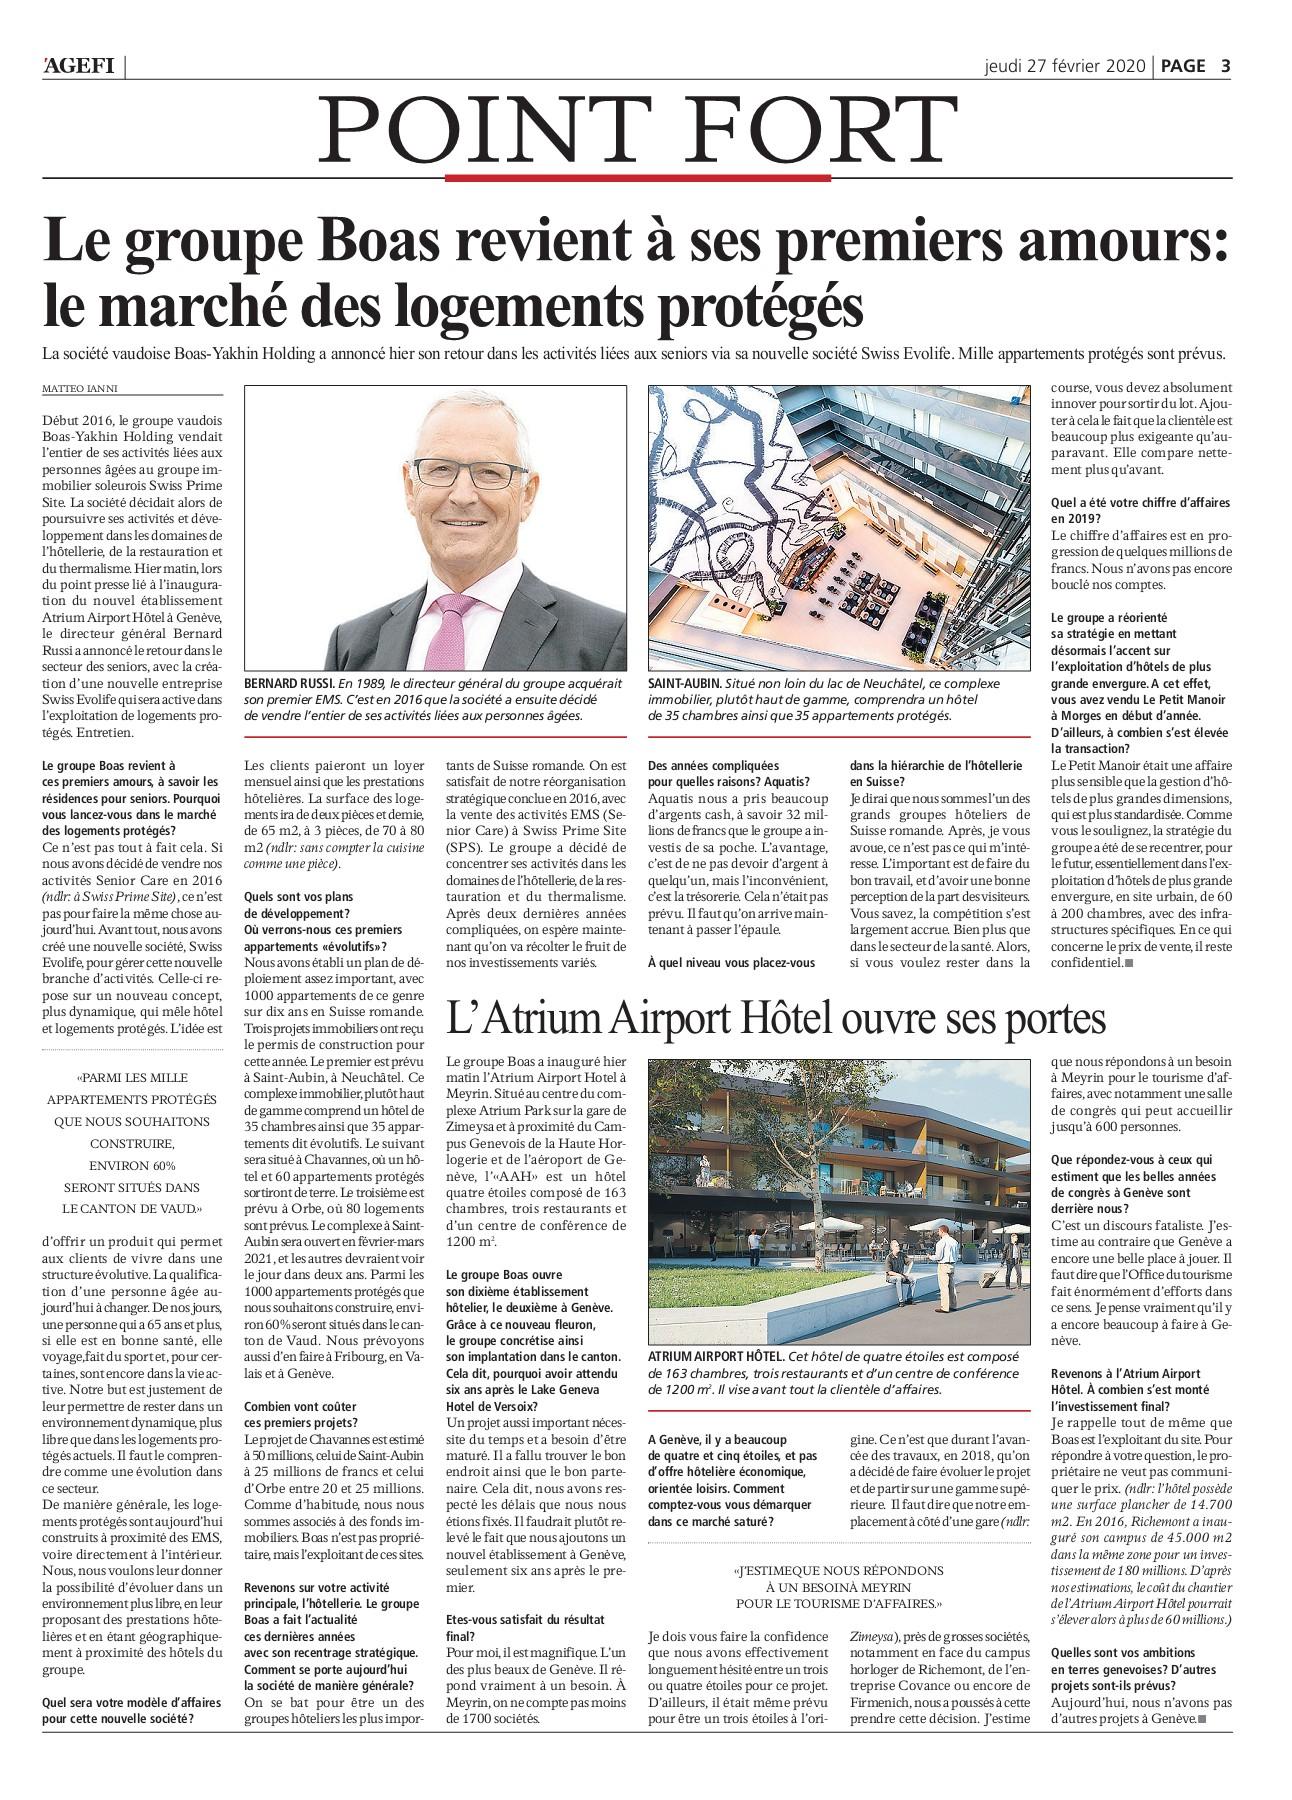 Bonus Porte Interne 2018 agefi quotidien 27.02.2020-flip book pages 1-18 | pubhtml5